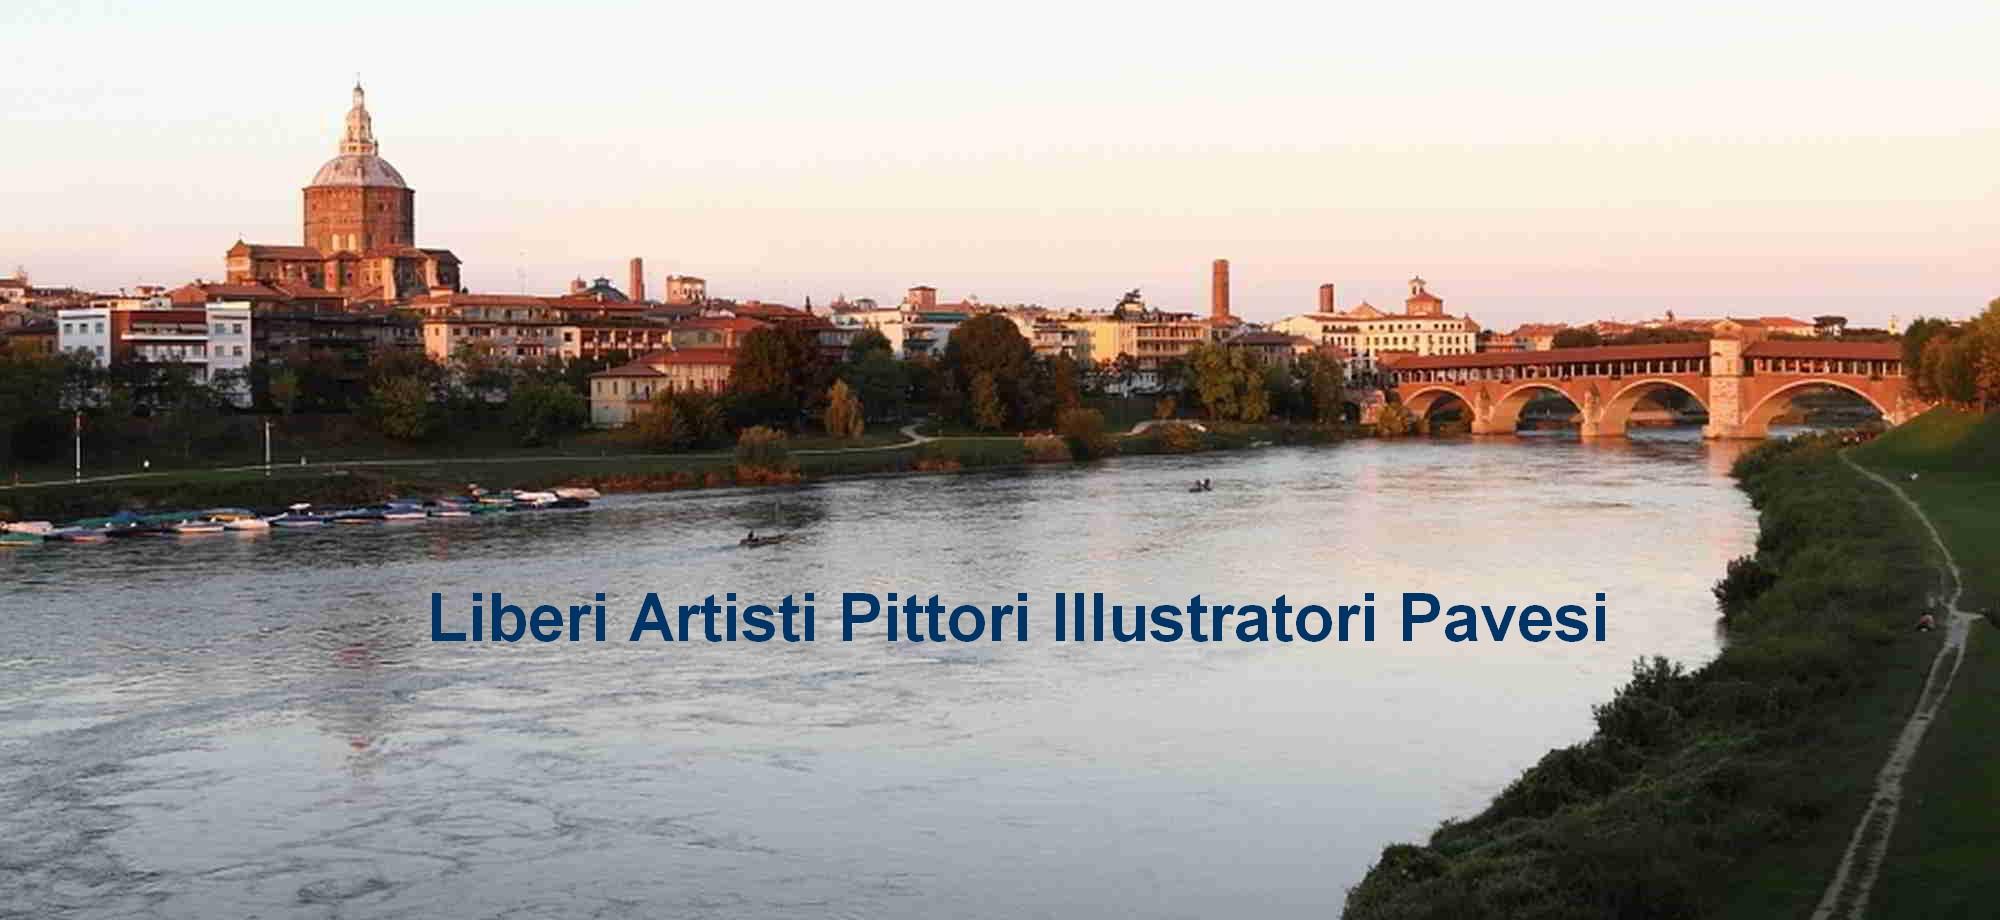 Liberi artisti pittori illustratori pavesi